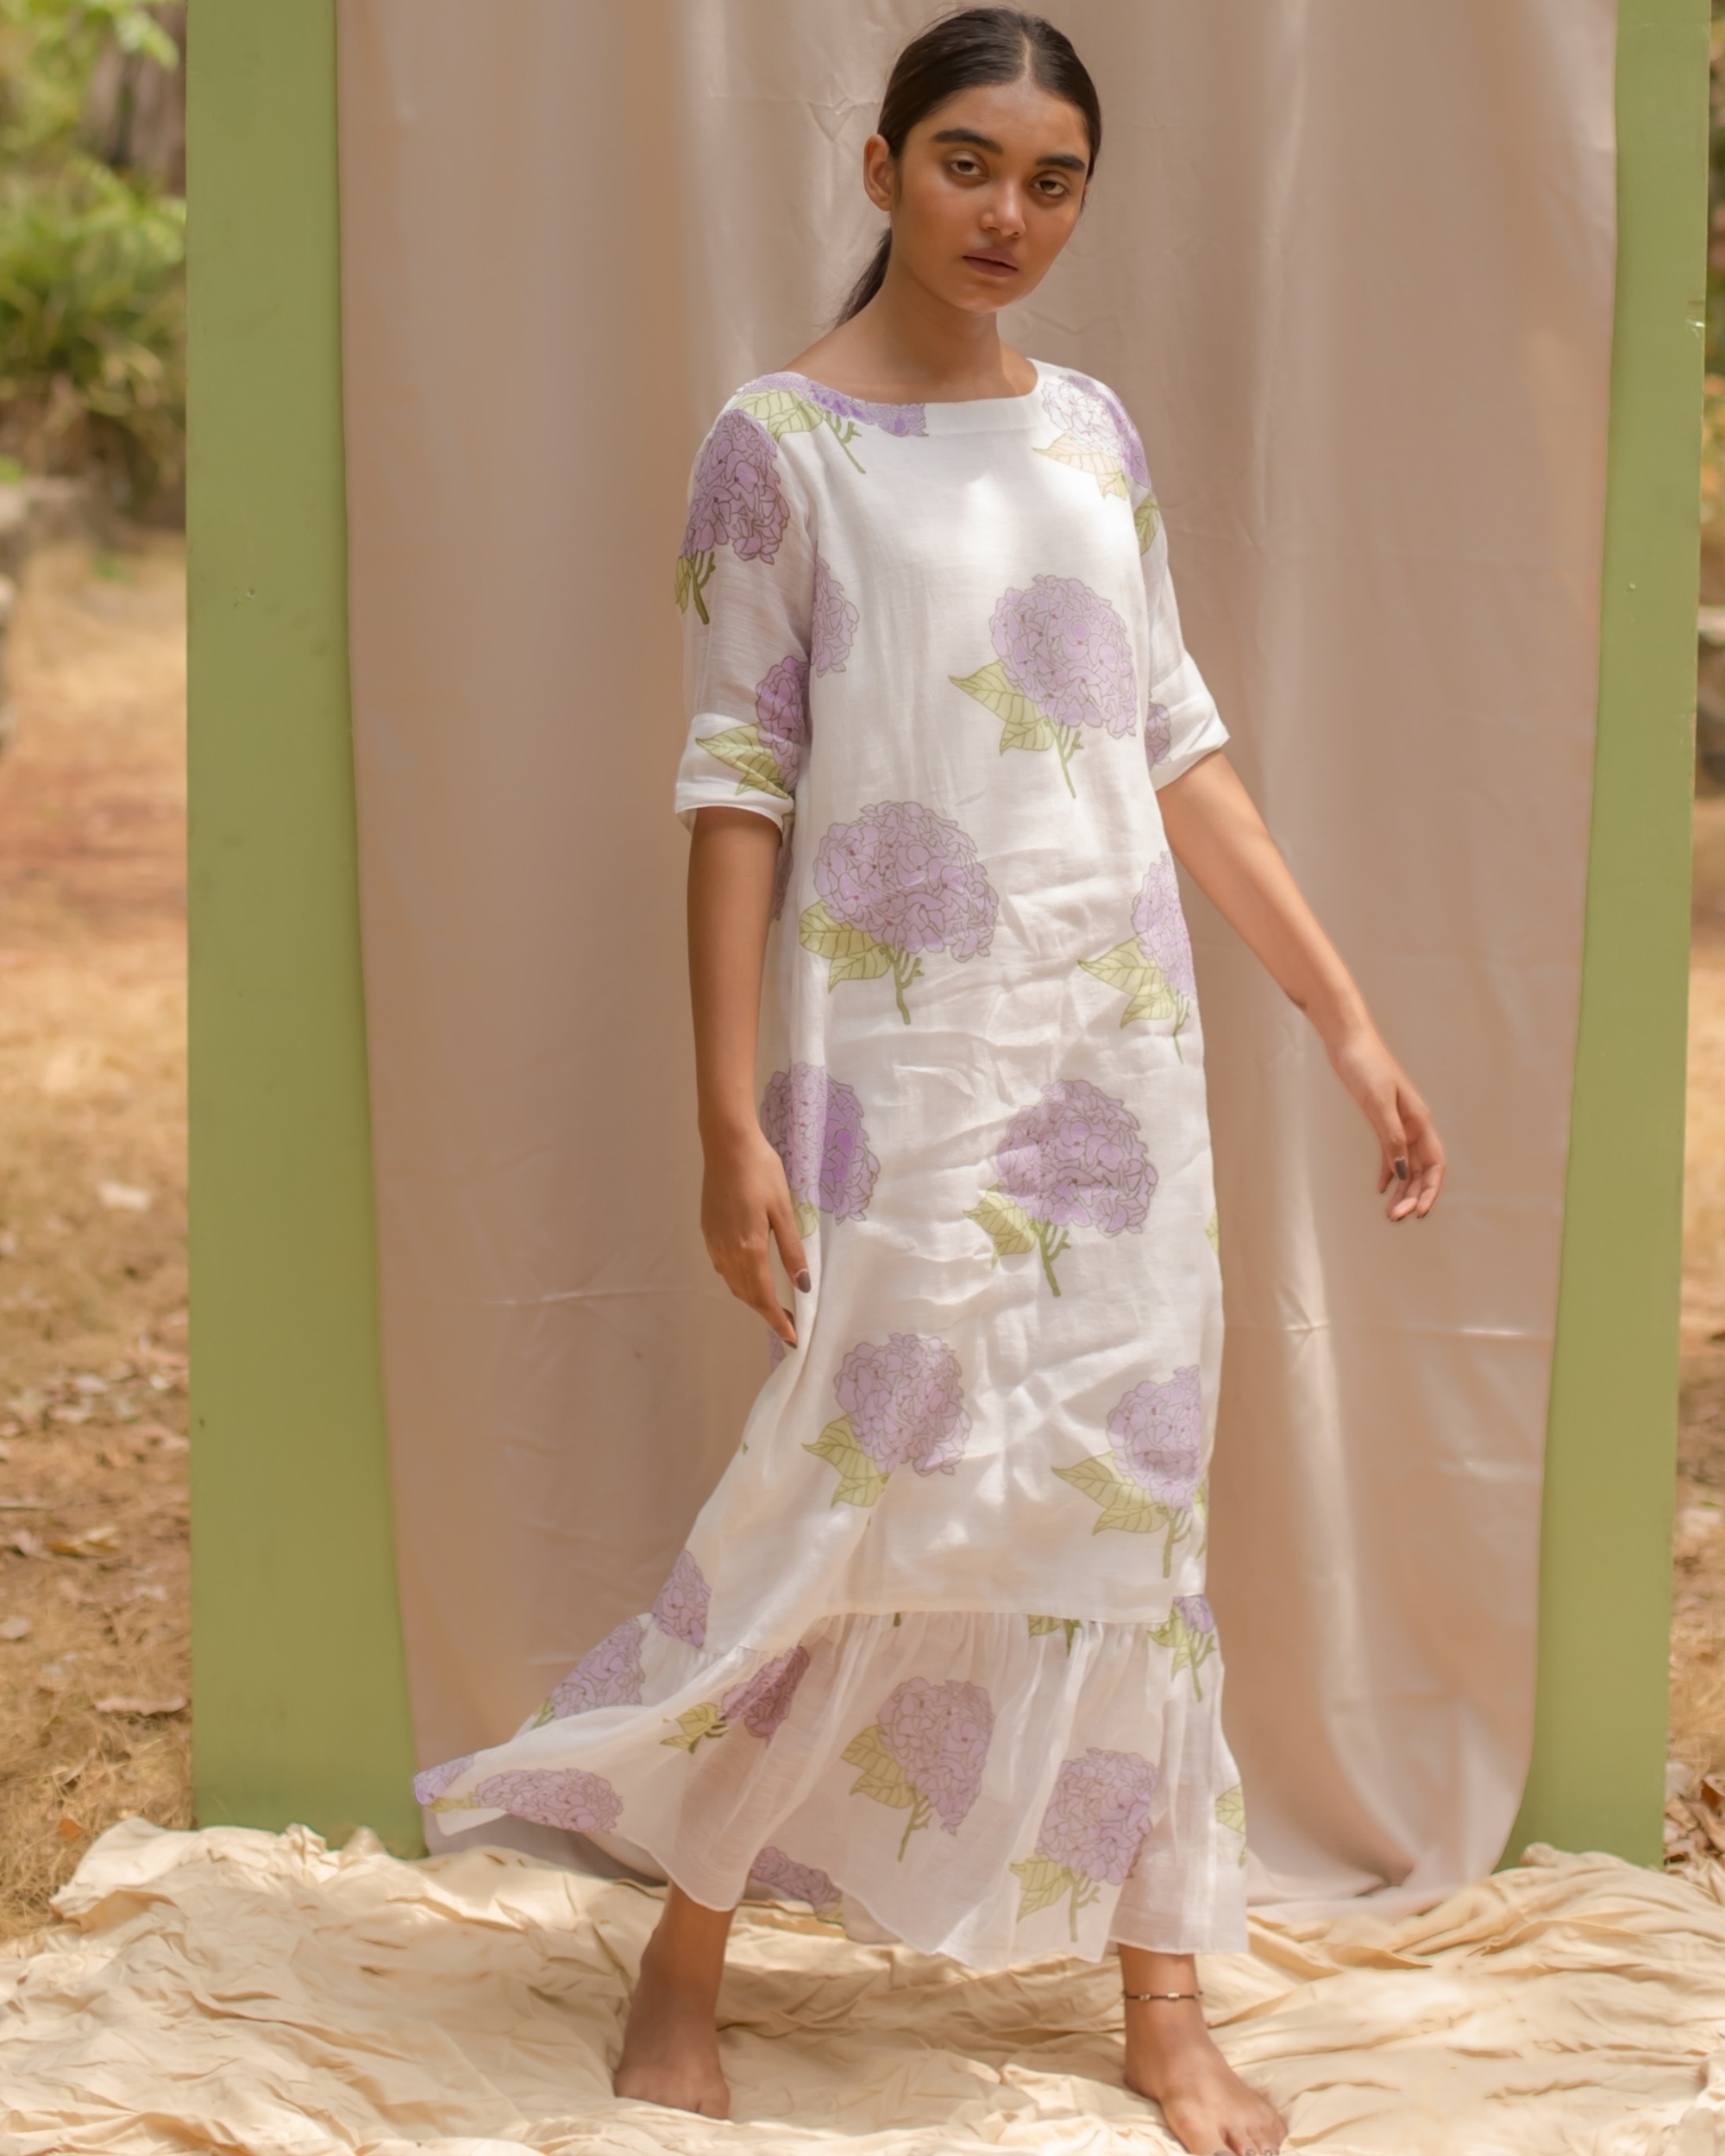 White Wedding Gown Hydrangea: White Chanderi Lilac Hydrangea Printed Dress By Kokum